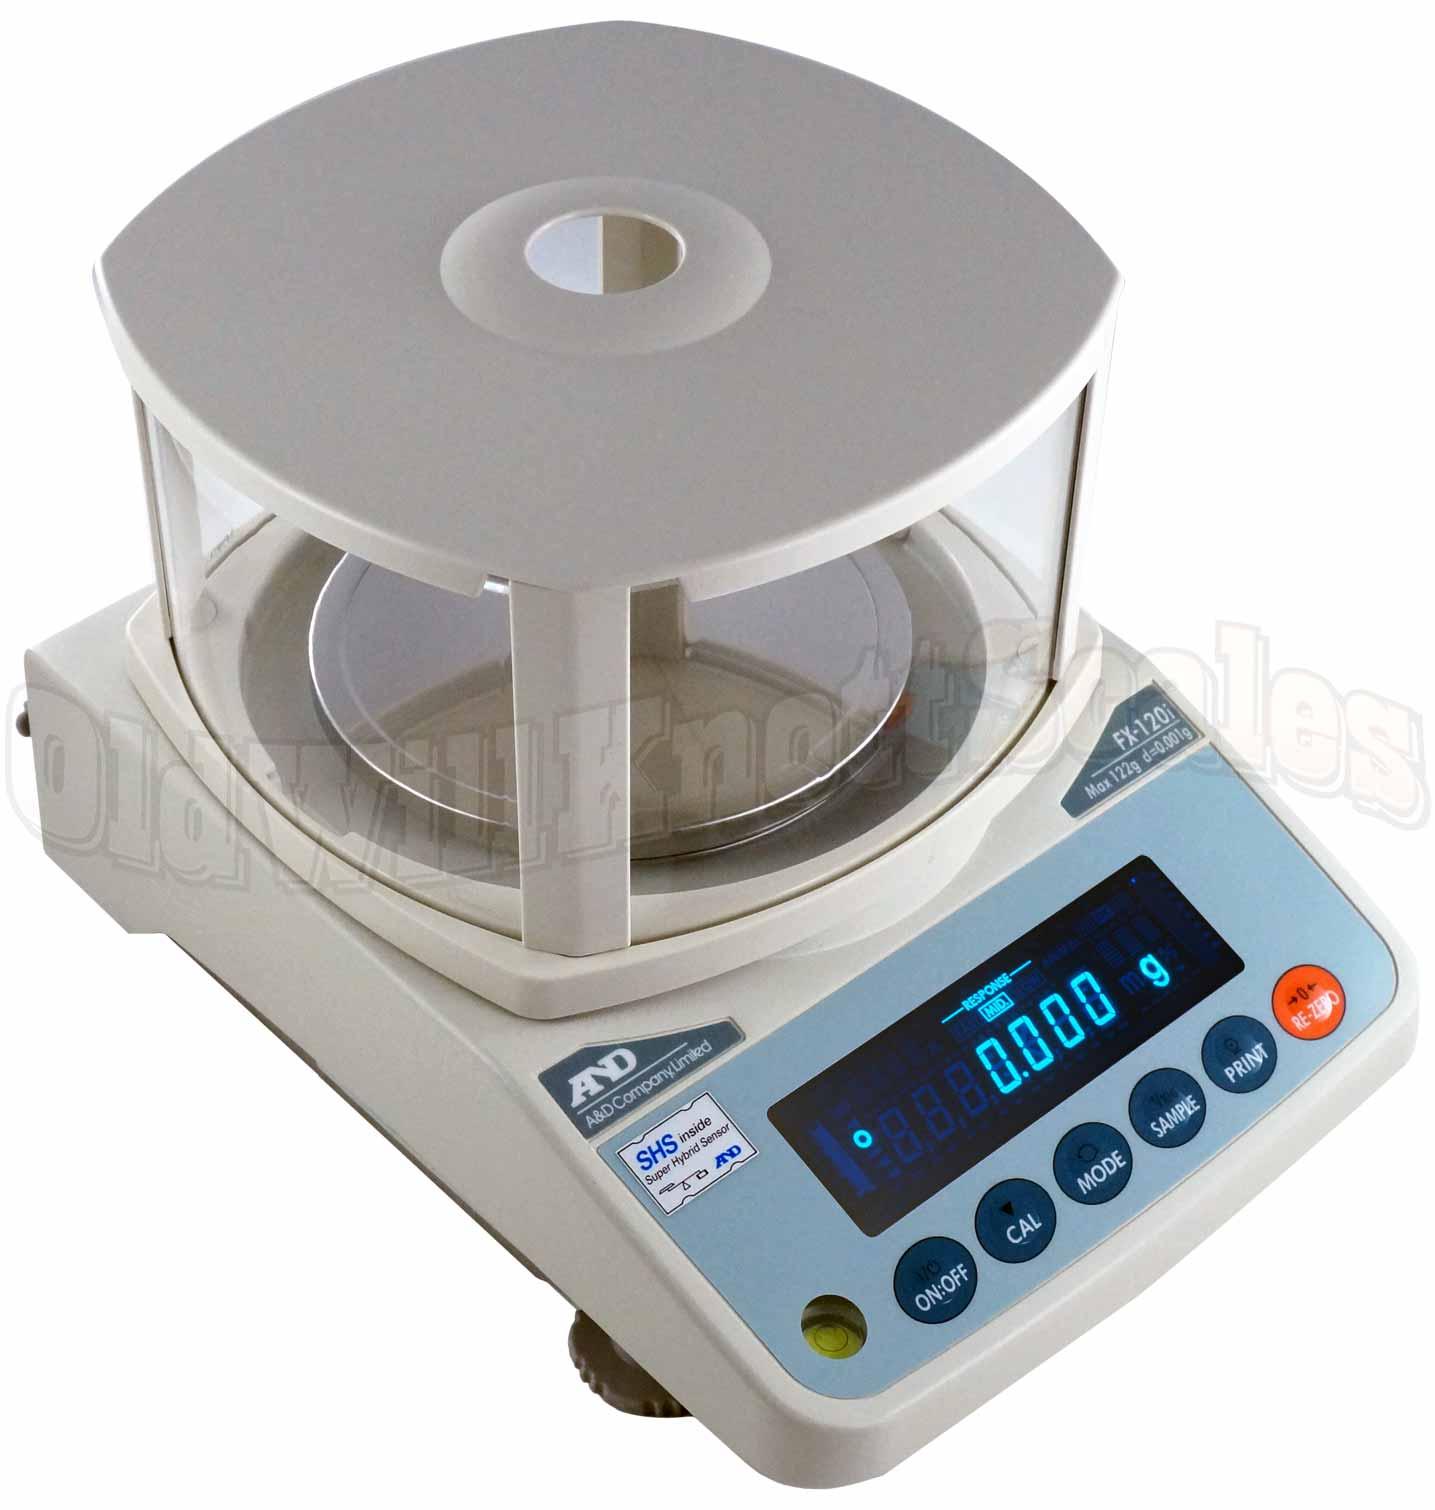 AD Scales FXi Series FX120i Toploader Precision Balance